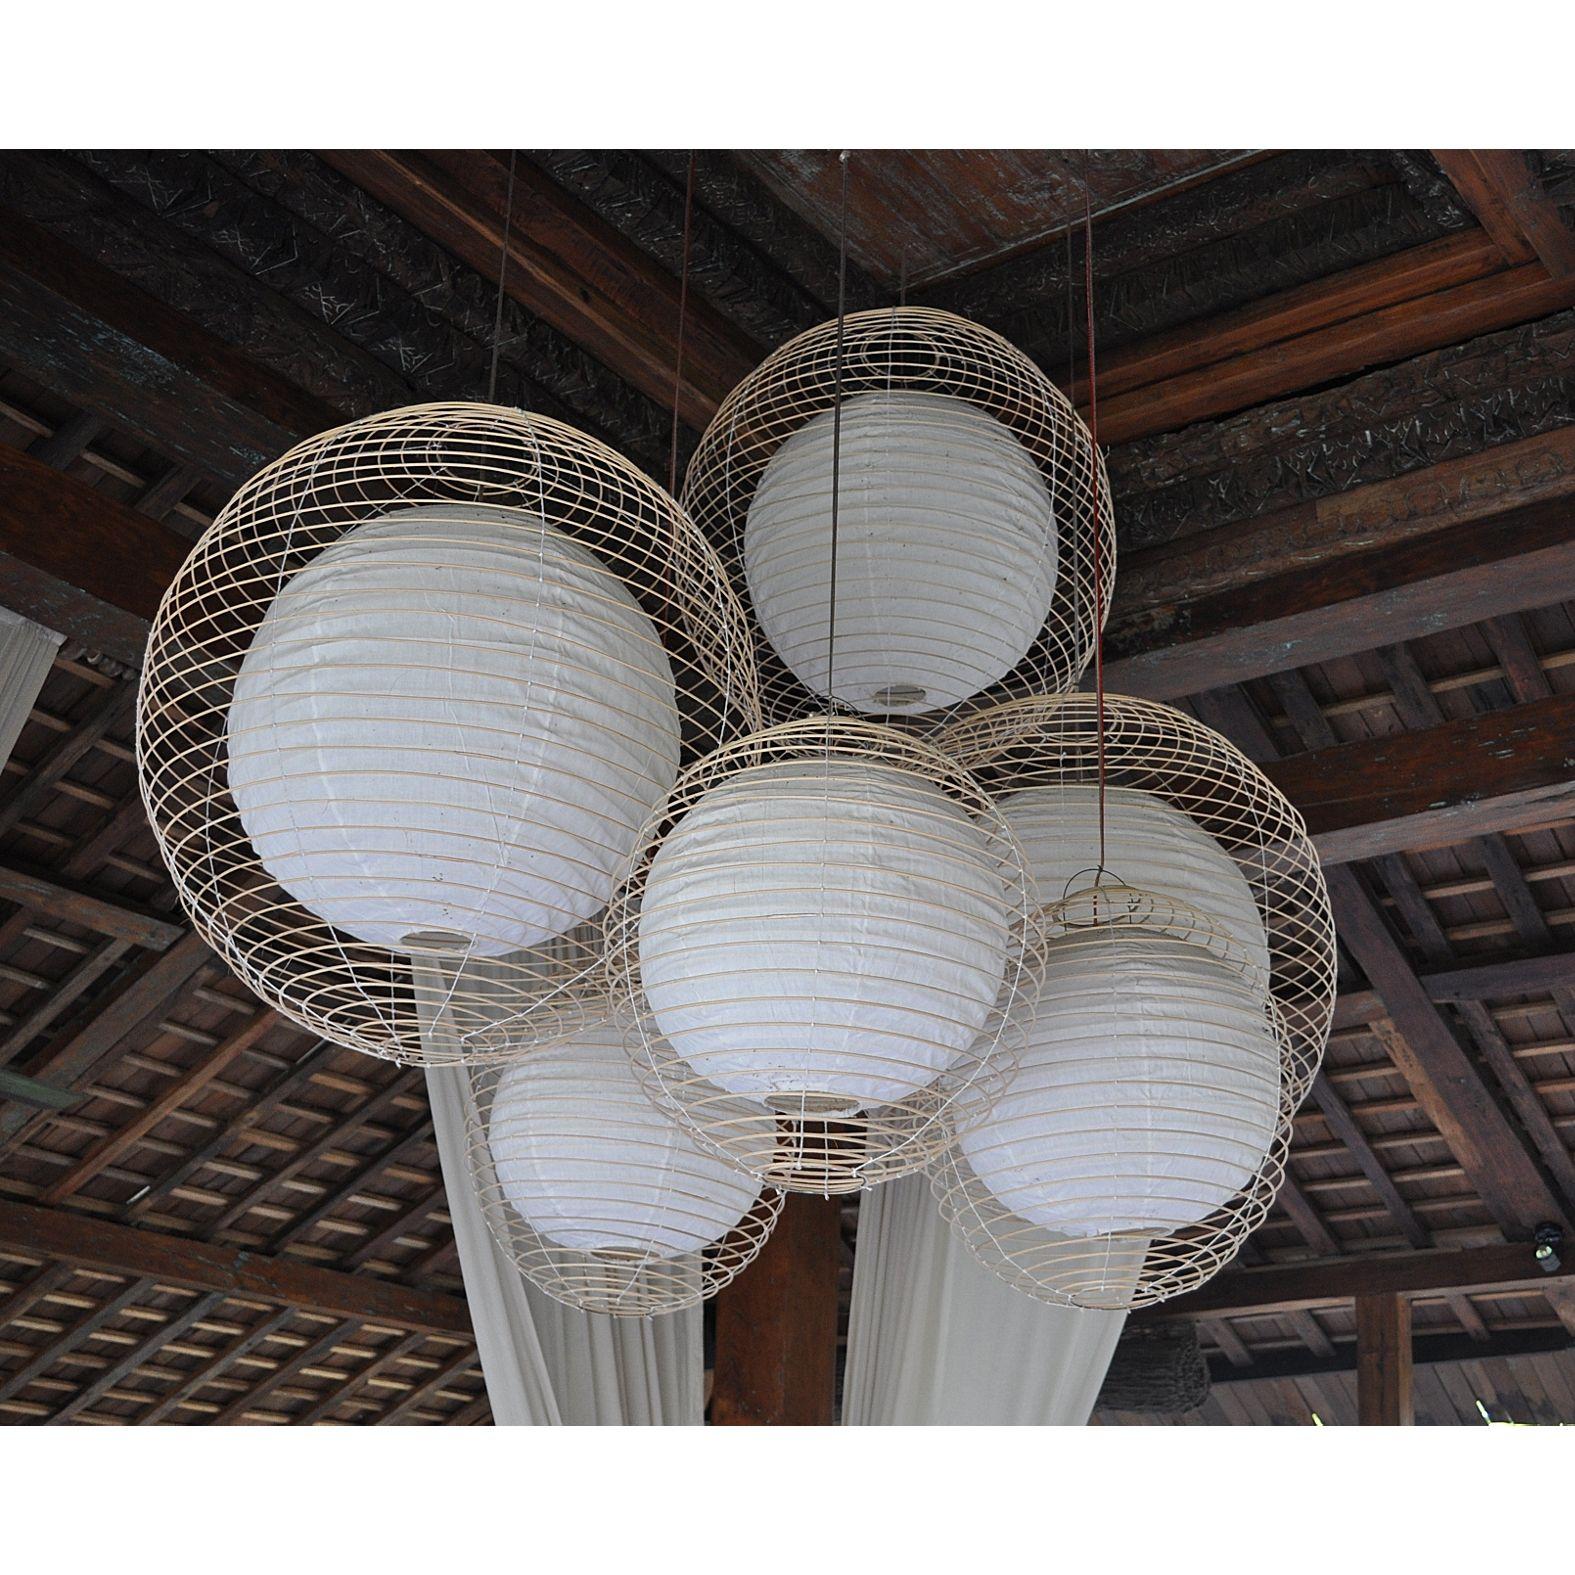 Name: Rattan & Fabric Round Pendant- Large Origins: Bali